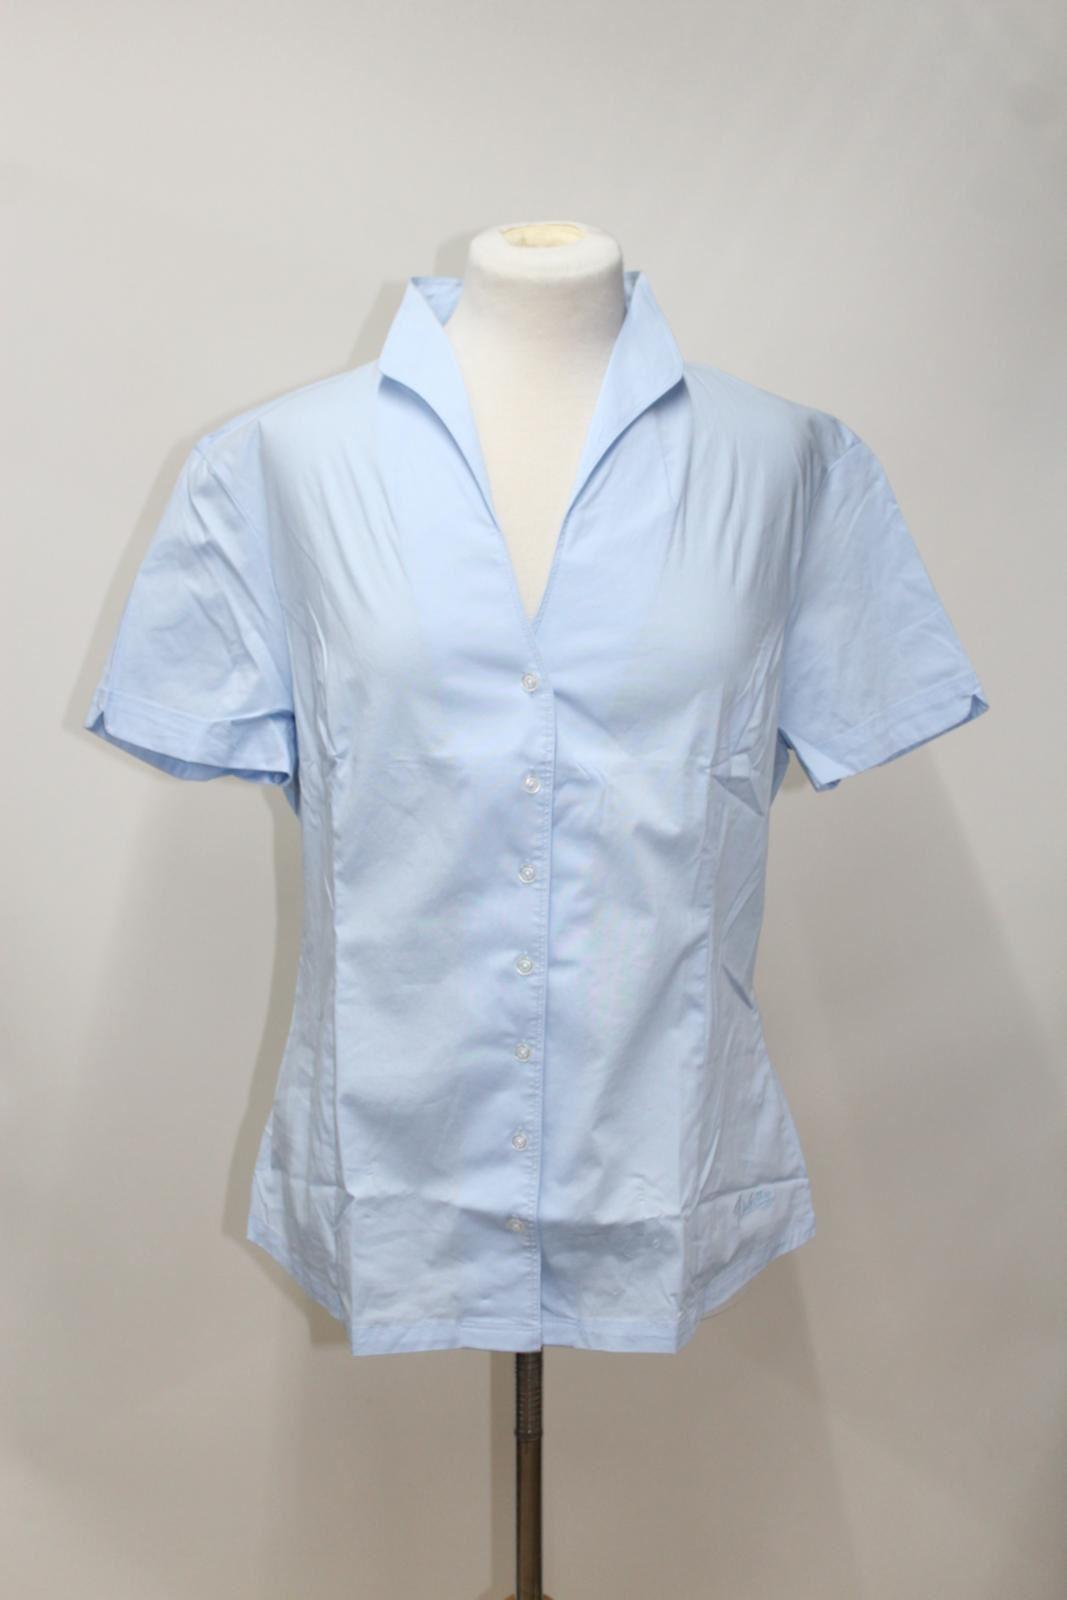 Cotton Starflower Shirt Uk18 Bnwt Collar Portrait Stretch Ladies Blue Dubarry Afax6OwqC